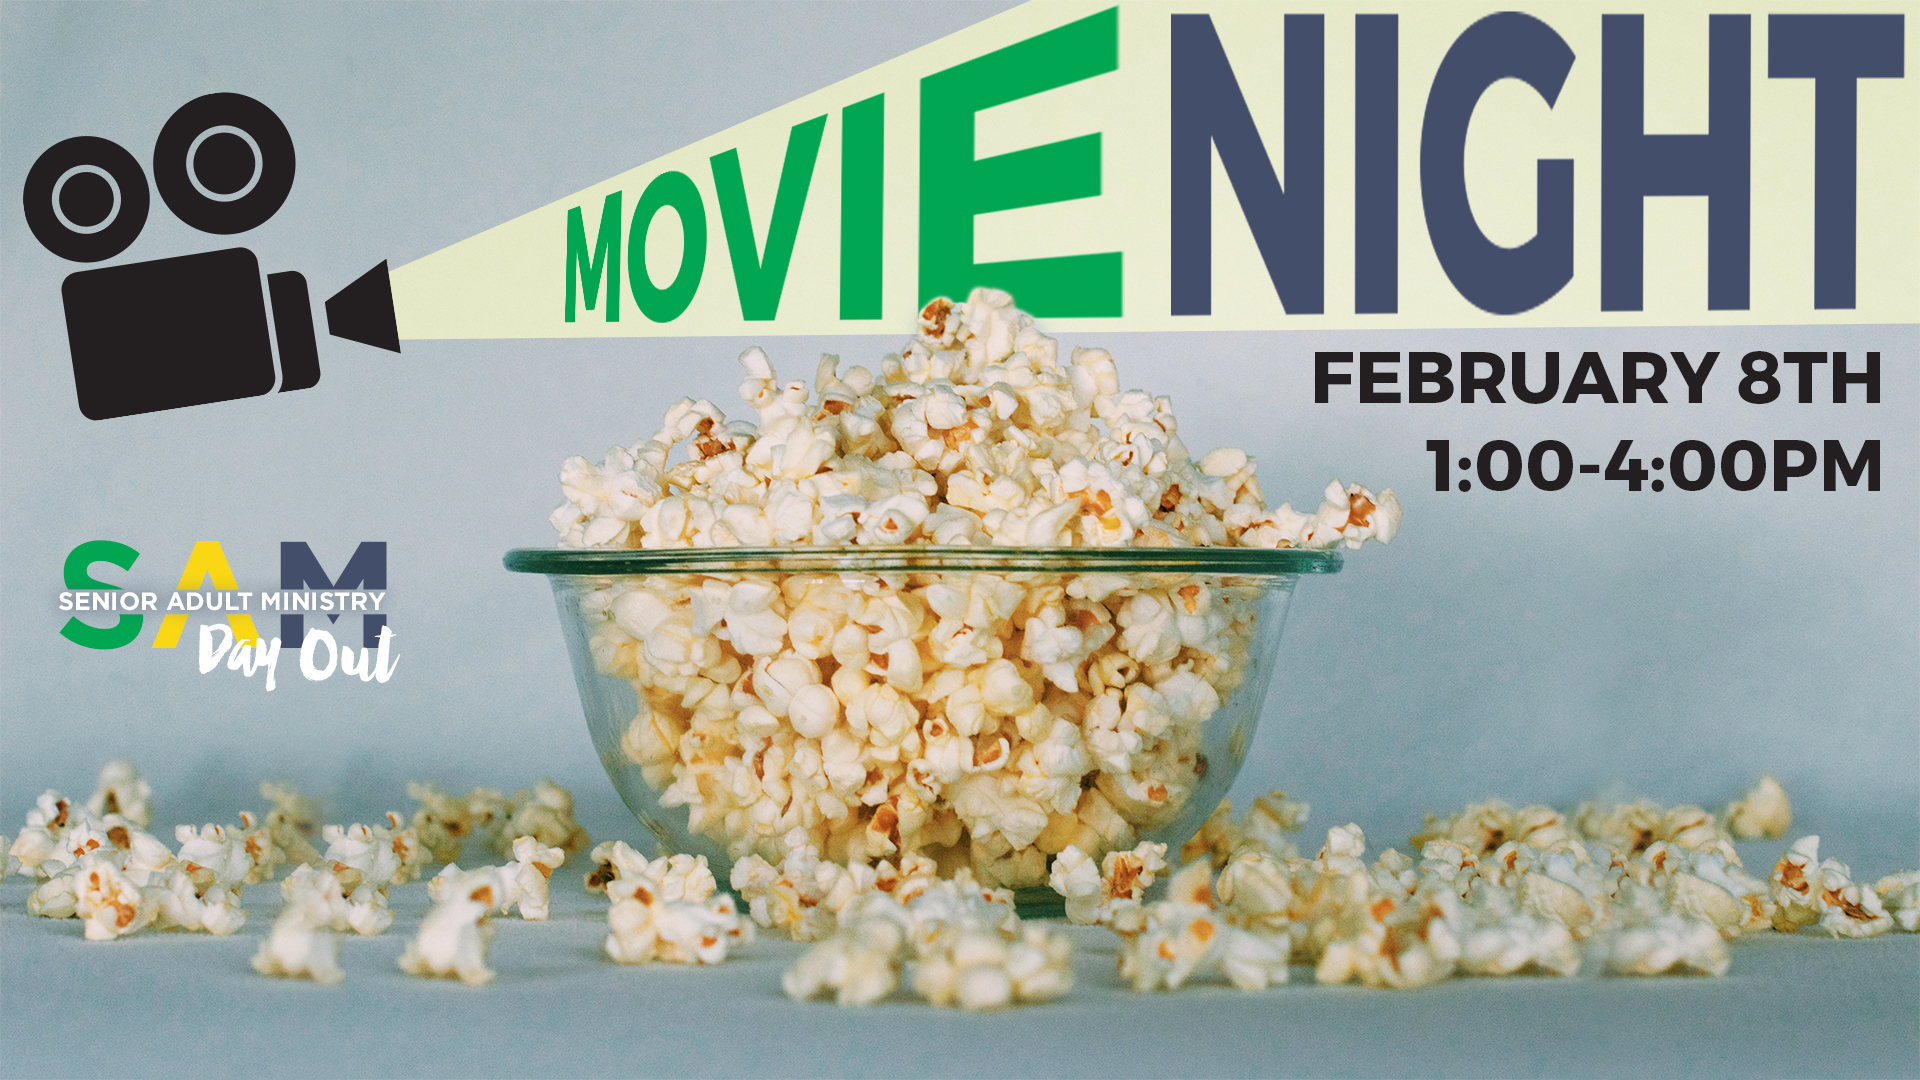 Movie Night Announcement Slide.jpg